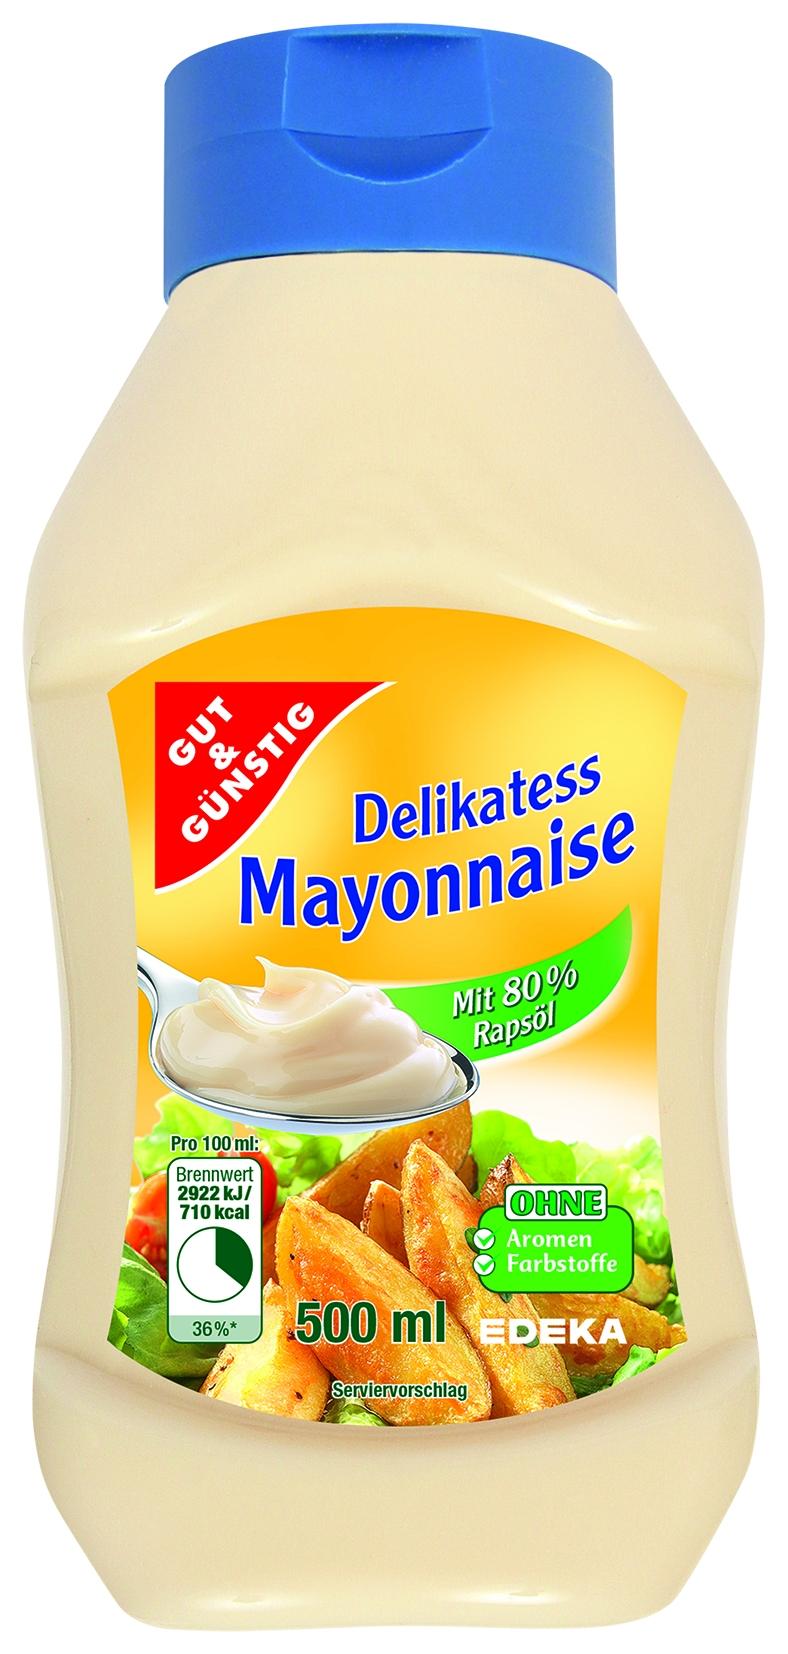 Delikatess Mayonnaise, Kopfstandflasche